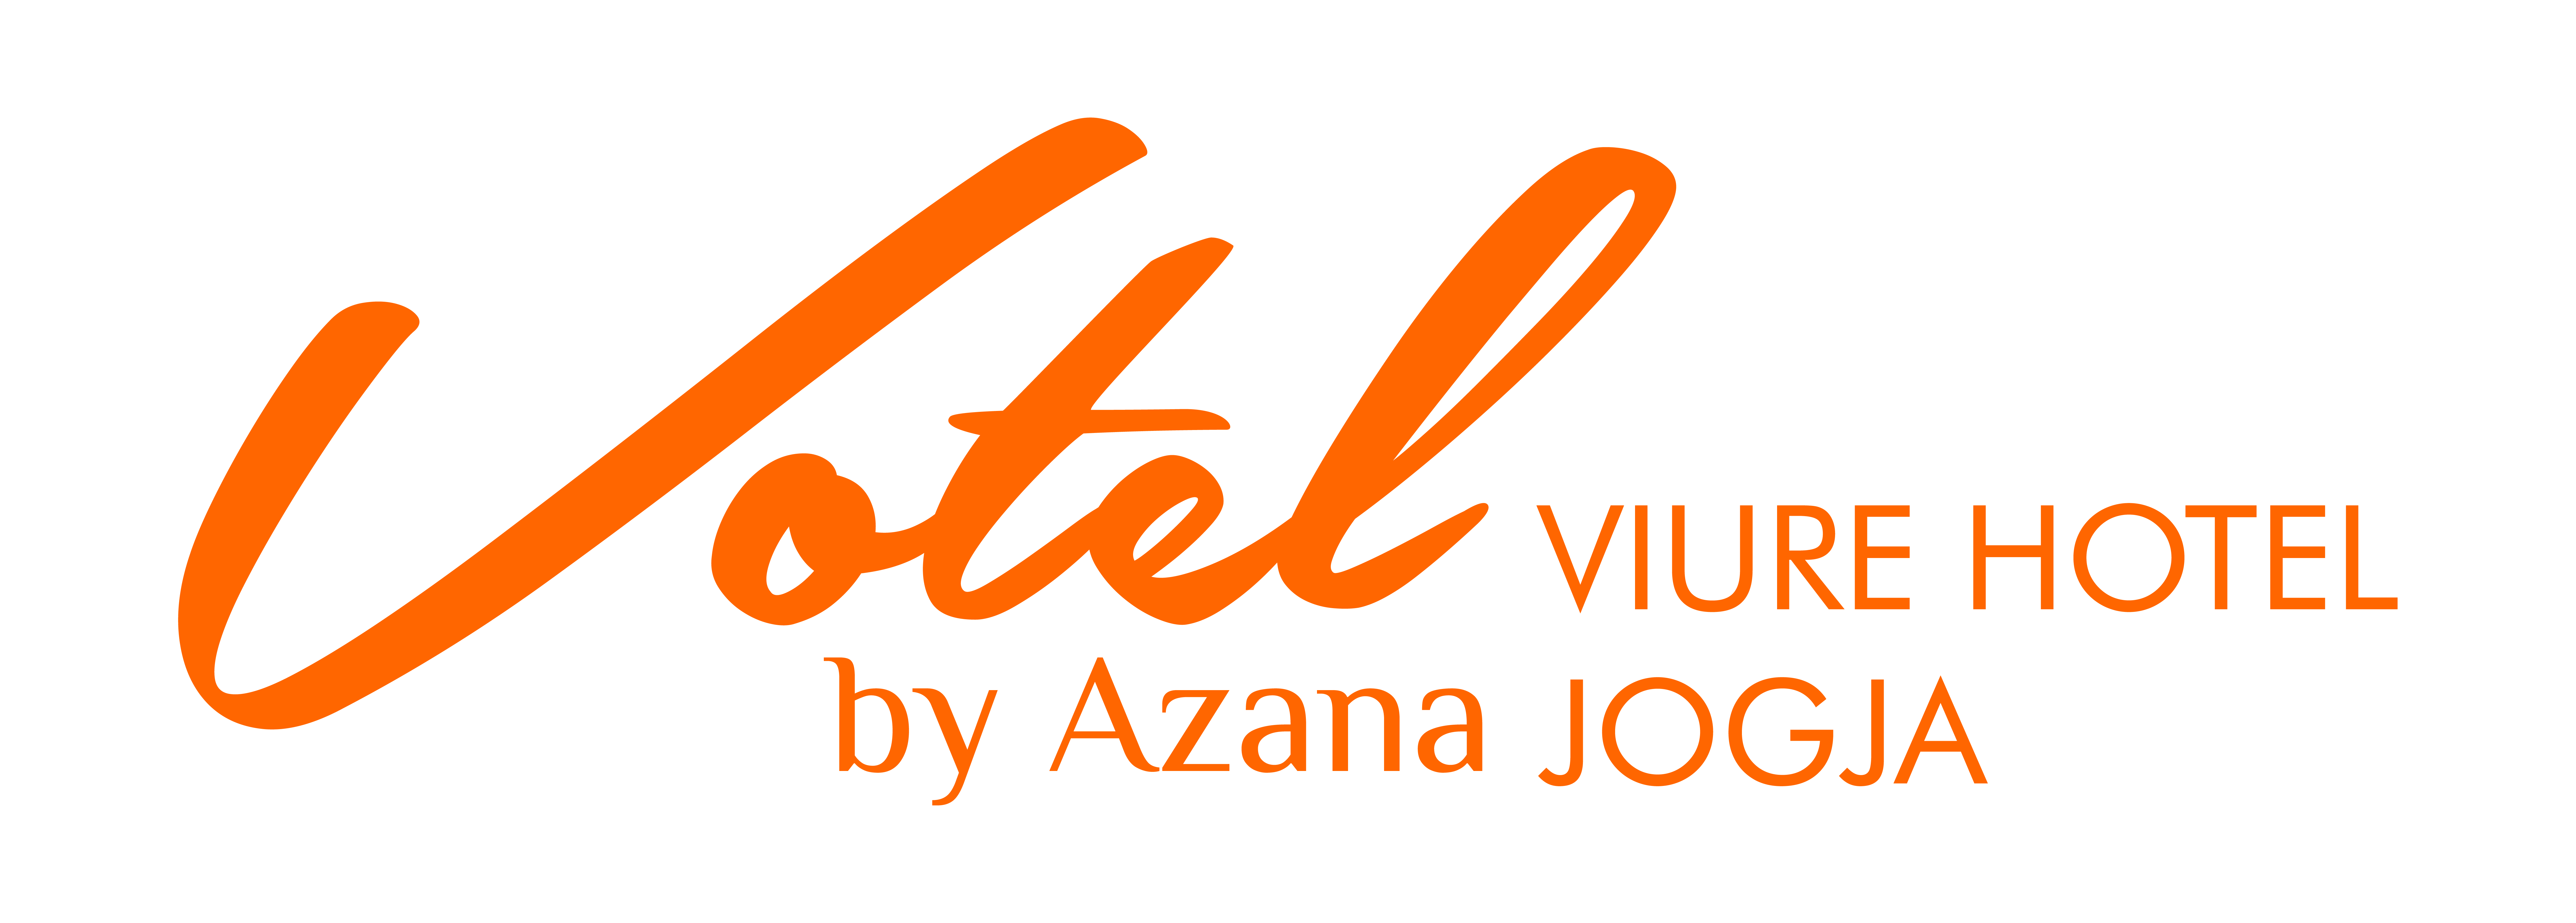 logo Votel Viure jogja-01